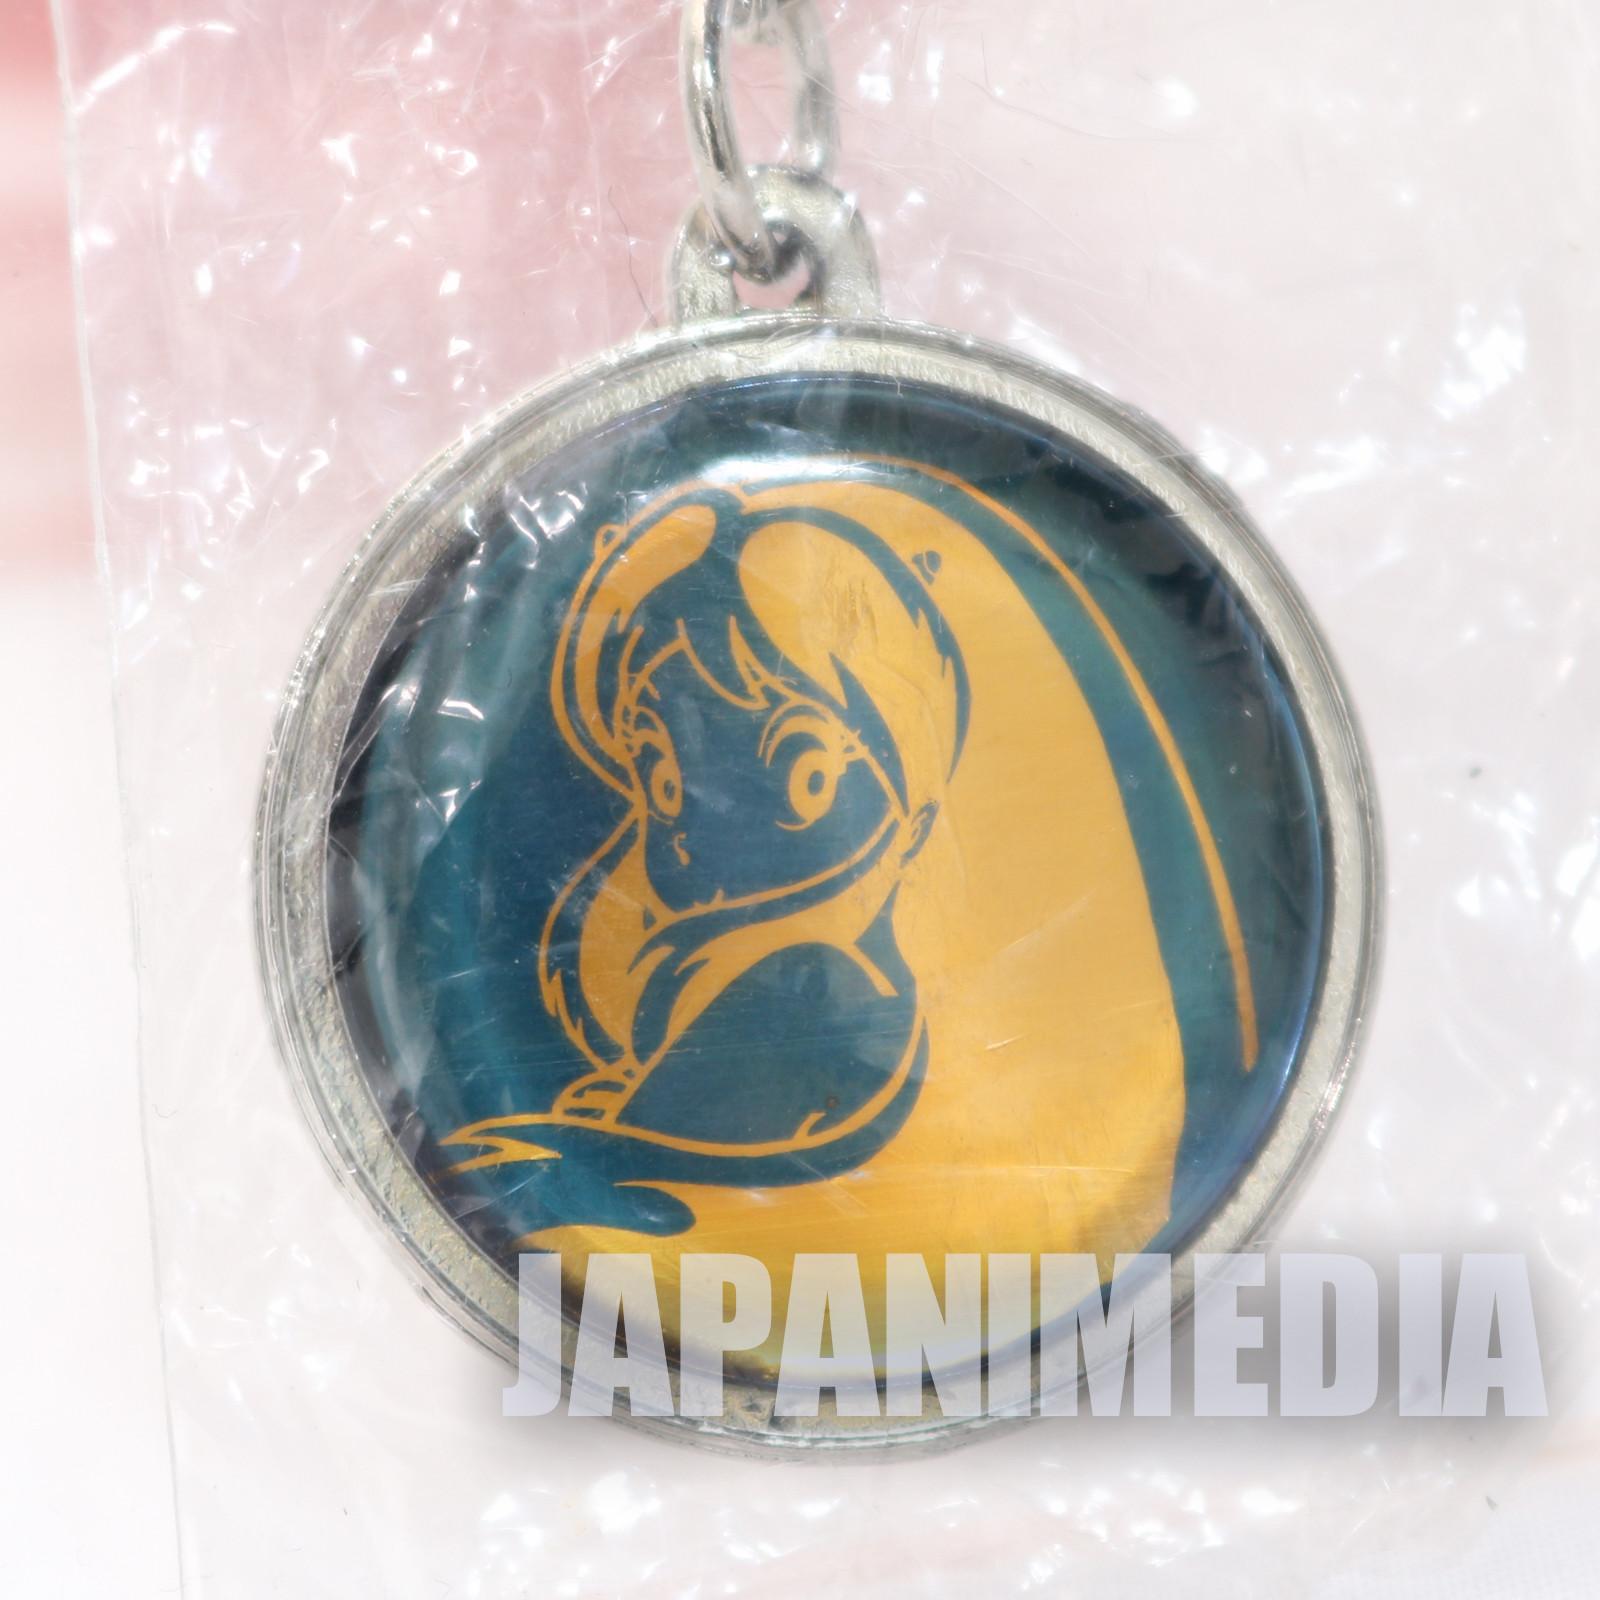 Retro RARE! Urusei Yatsura Metal Mascot Keychain JAPAN ANIME RUMIKO TAKAHASHI 2